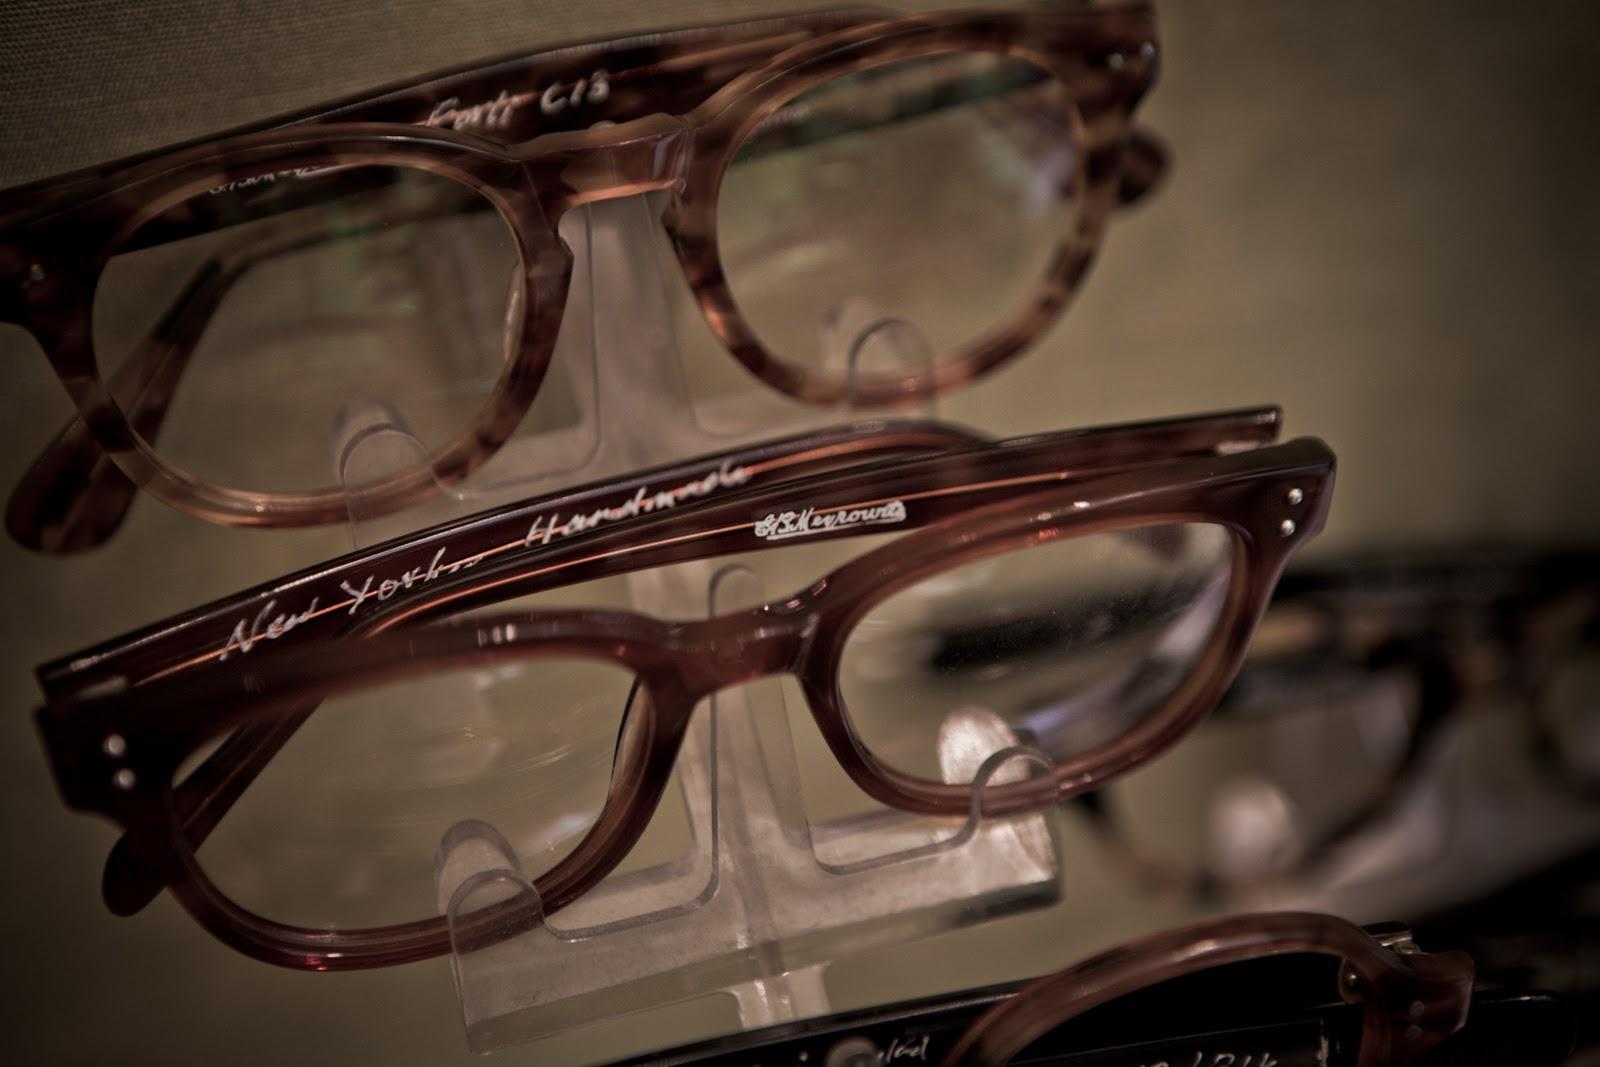 d7996b1b56 EB Meyrowitz  Handmade glasses – Permanent Style